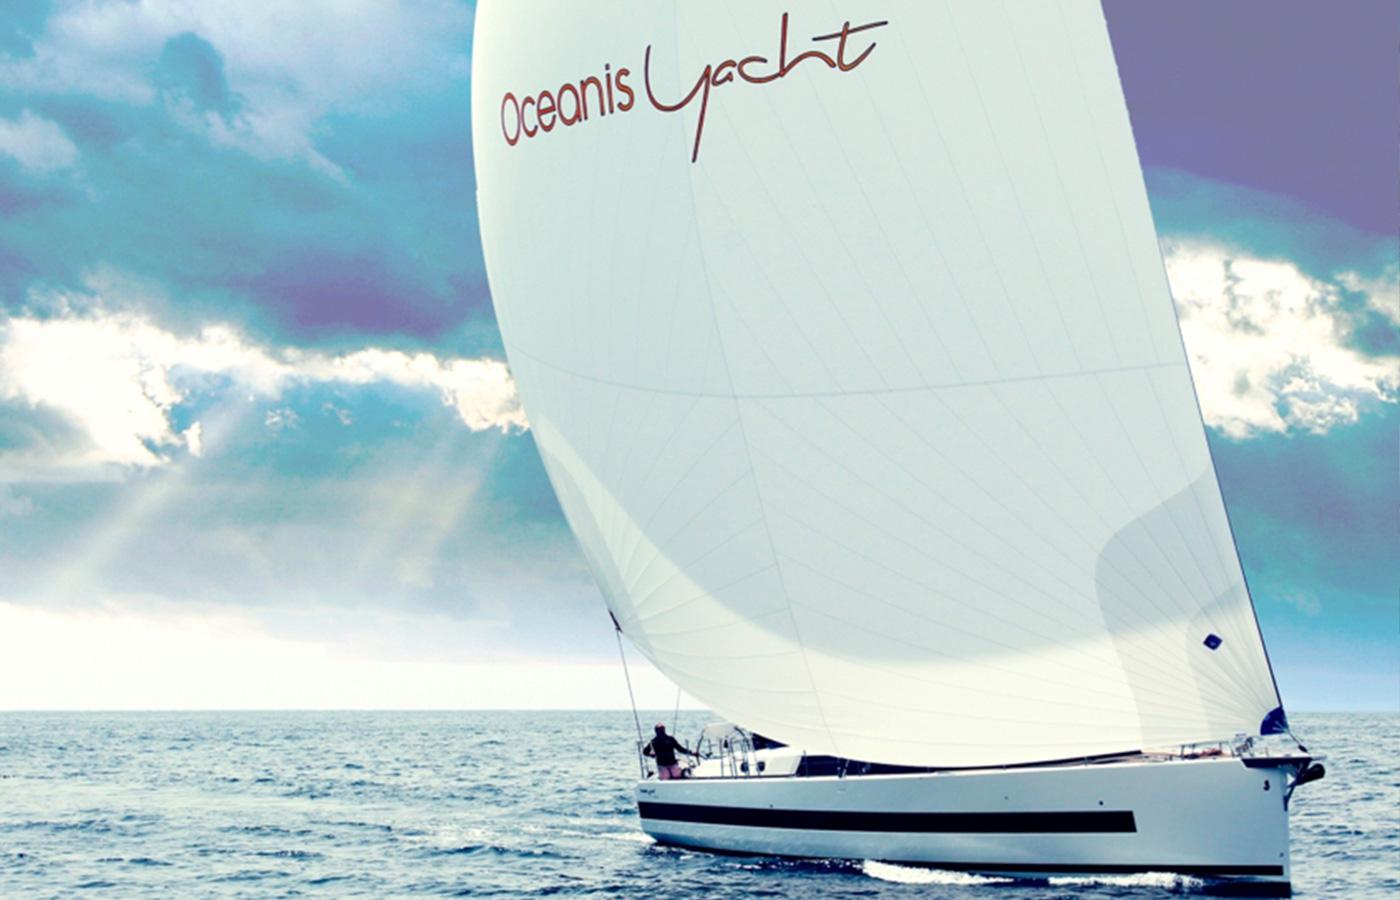 Beneteau Oceanis 62 Walkthrough